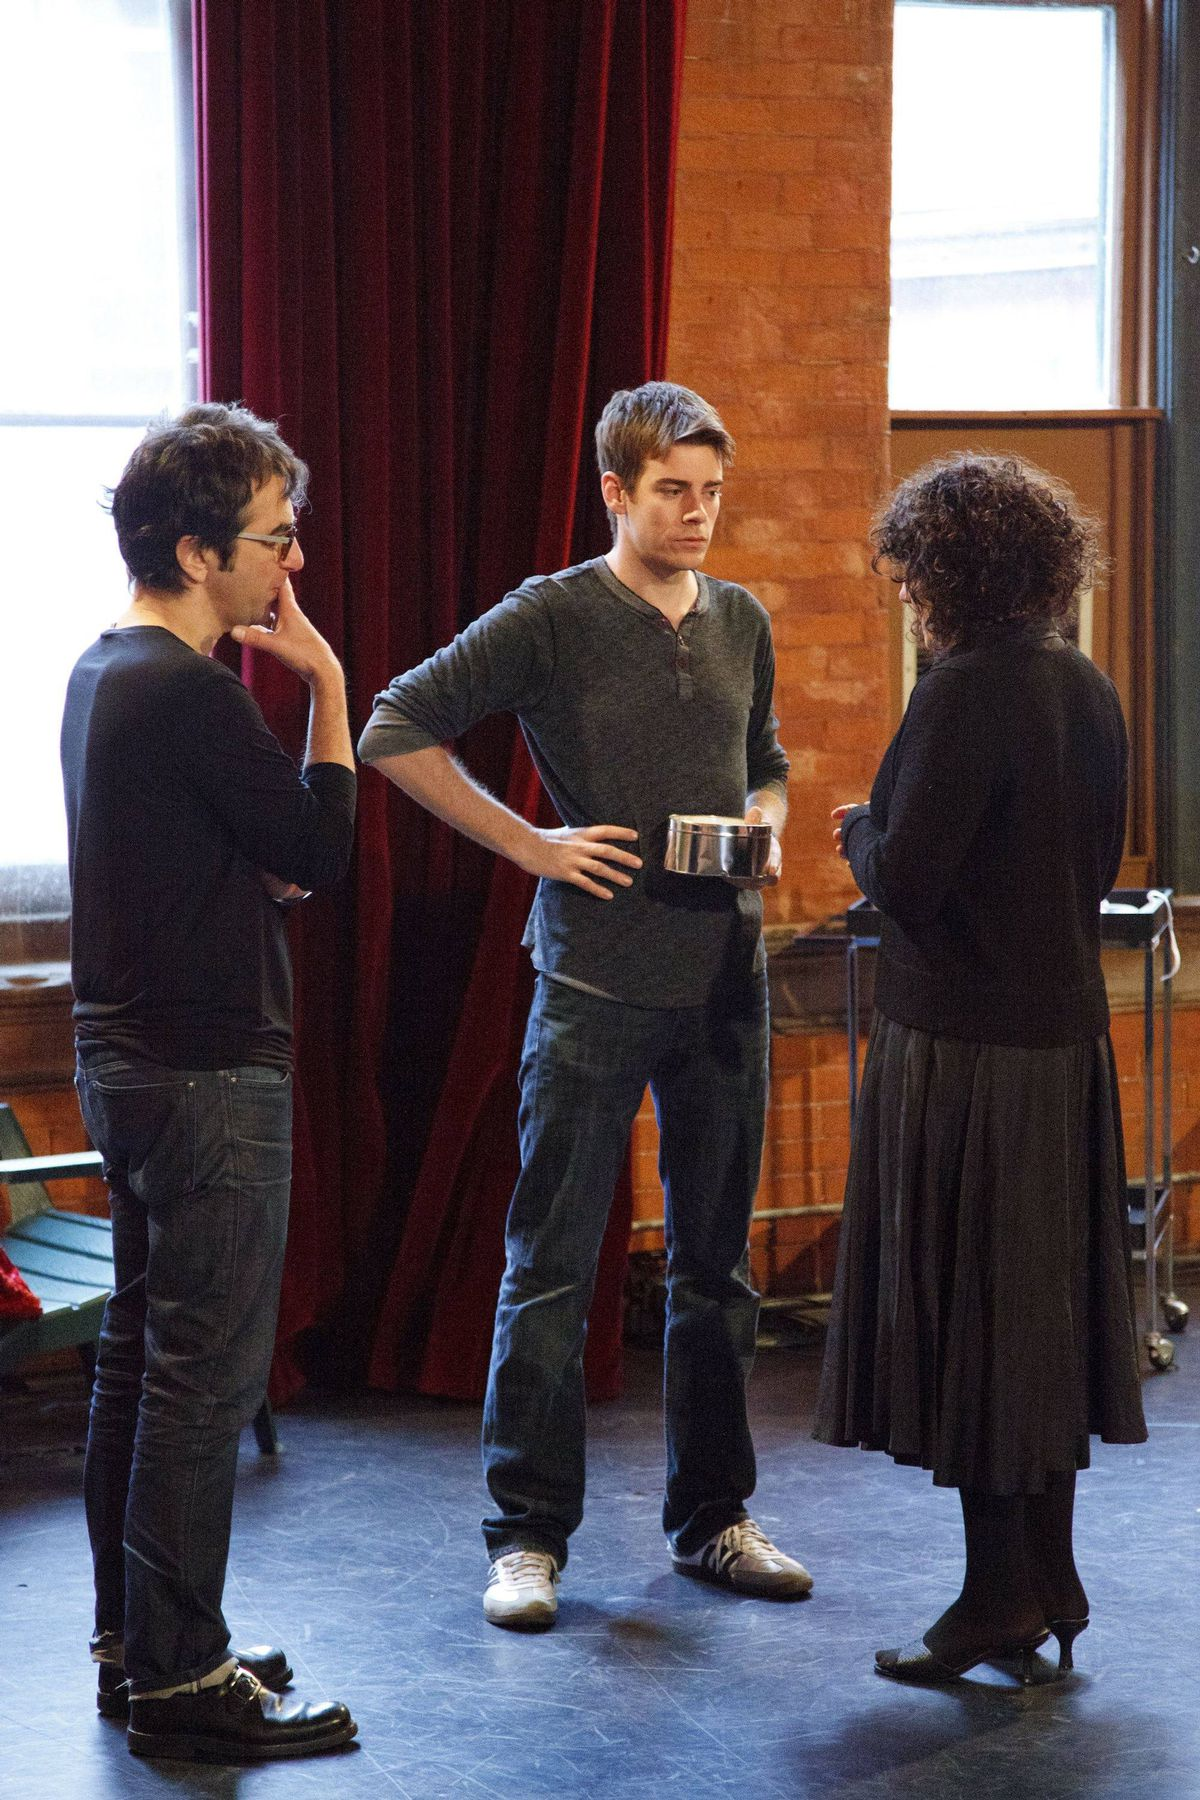 Atom Egoyan, Jeff Lillico, Arsinee Khanjian in rehearsal.